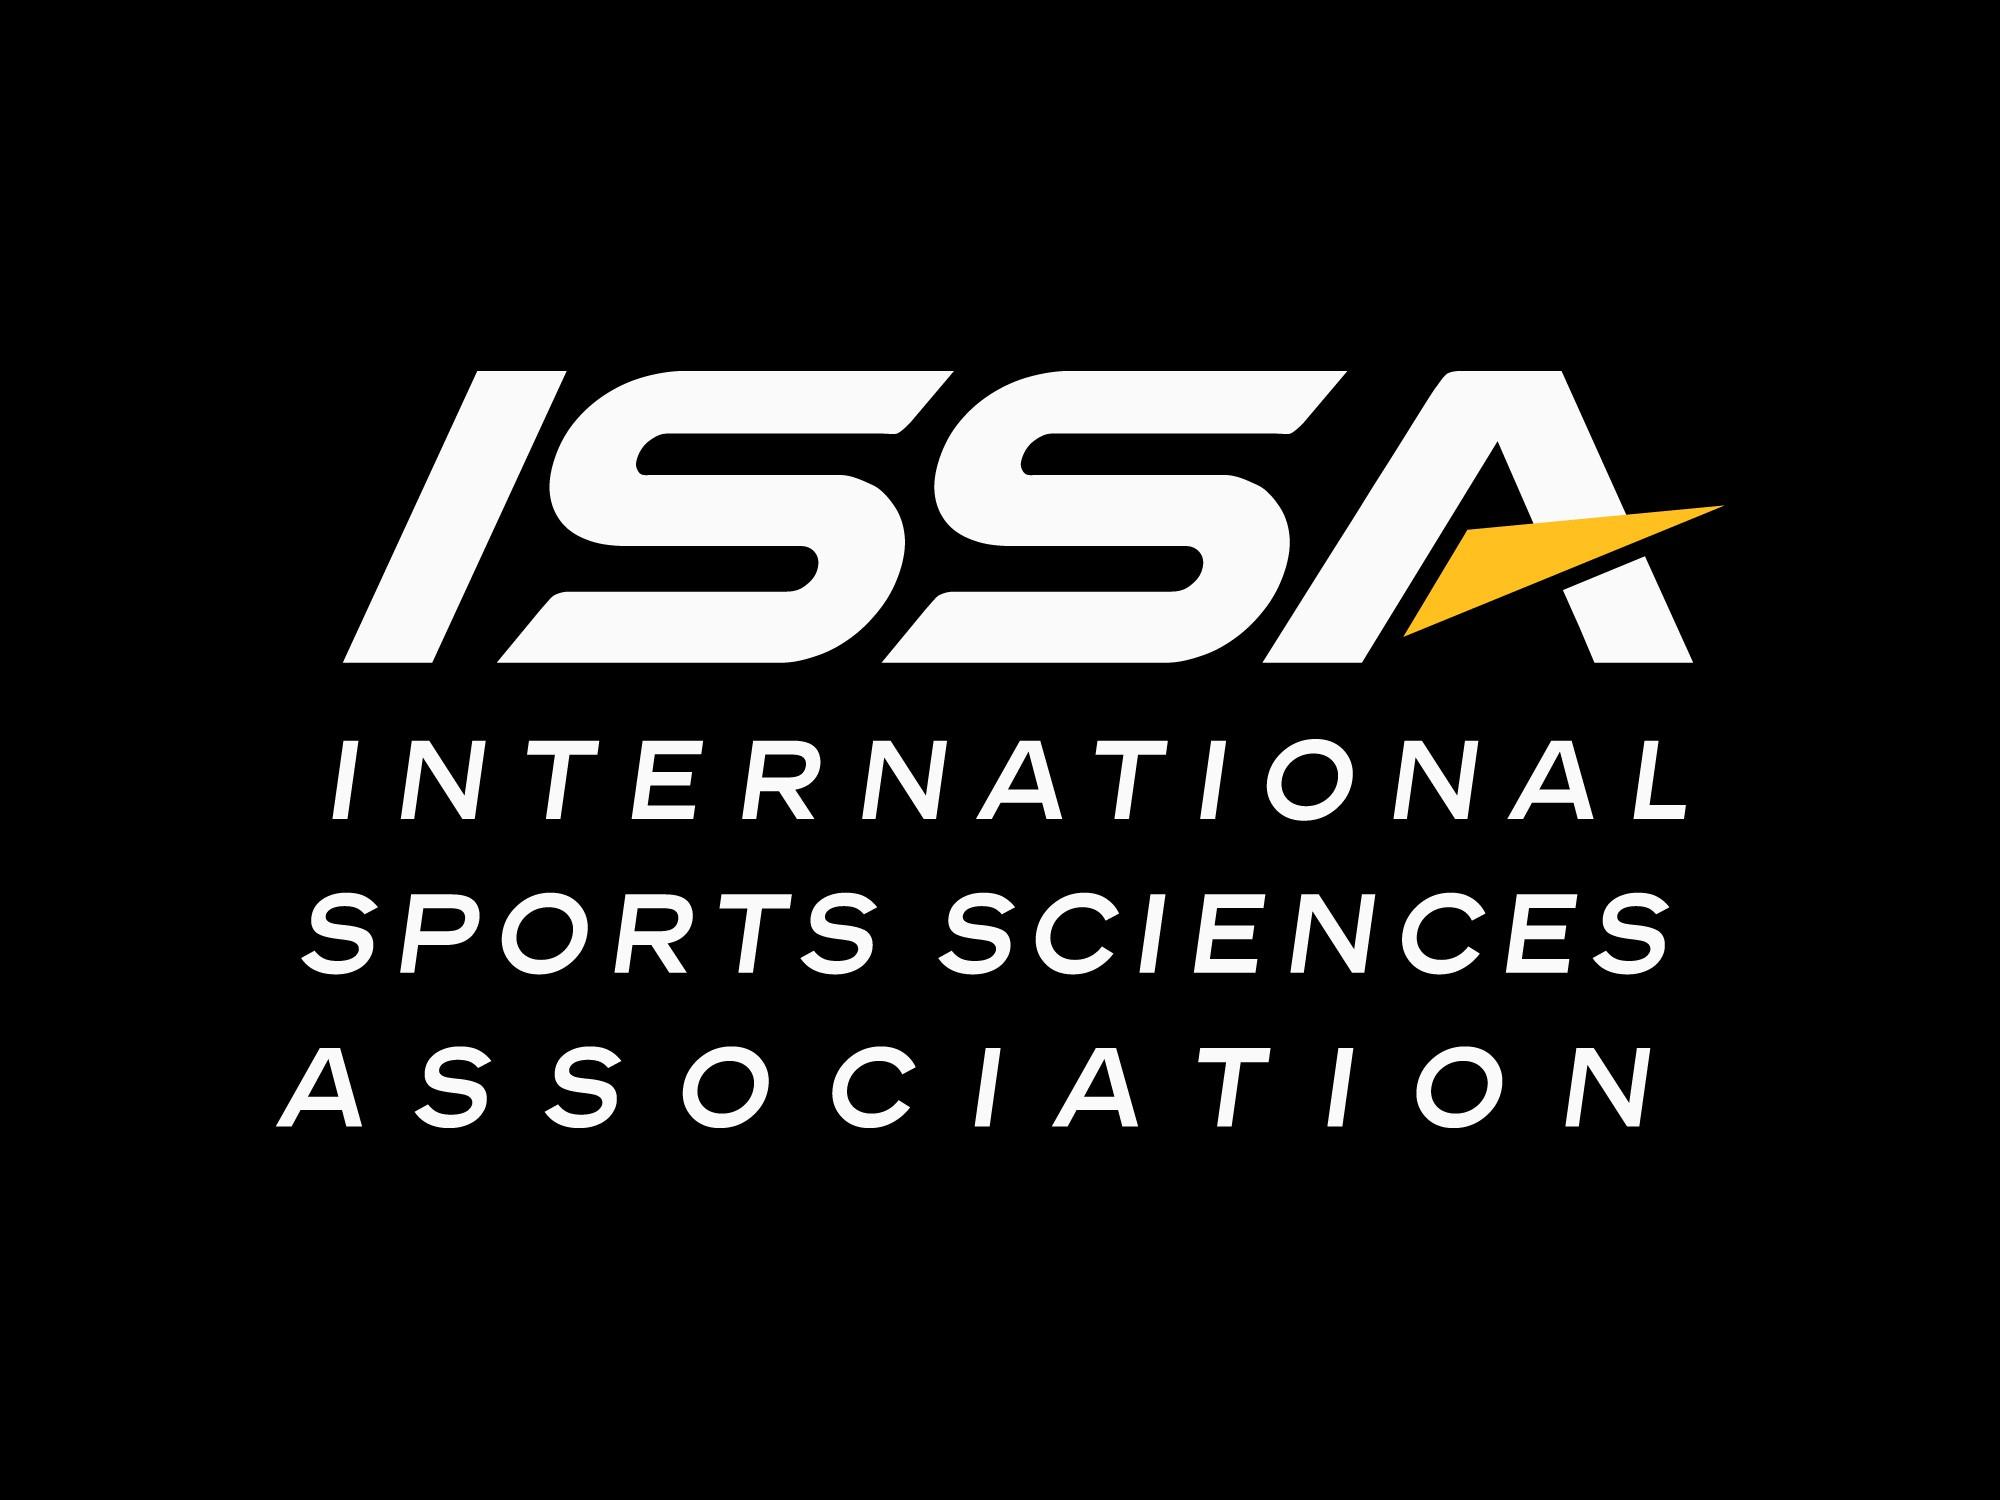 ISSA) International Sports Sciences